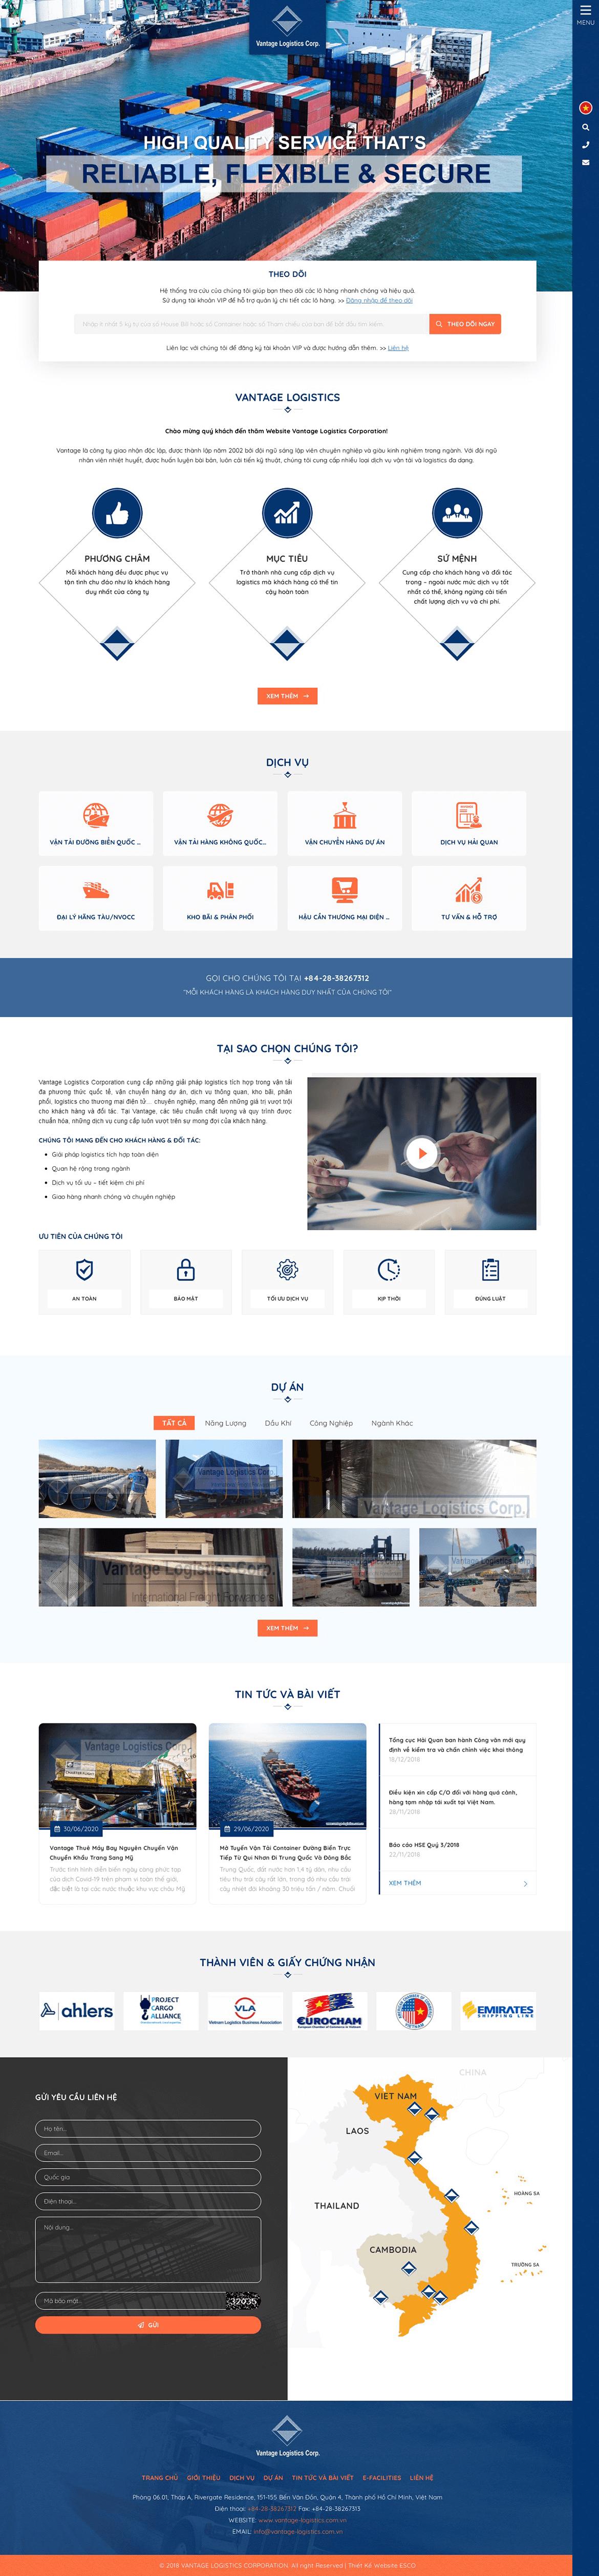 Thiết kế website công ty vantage-logistics.com.vn